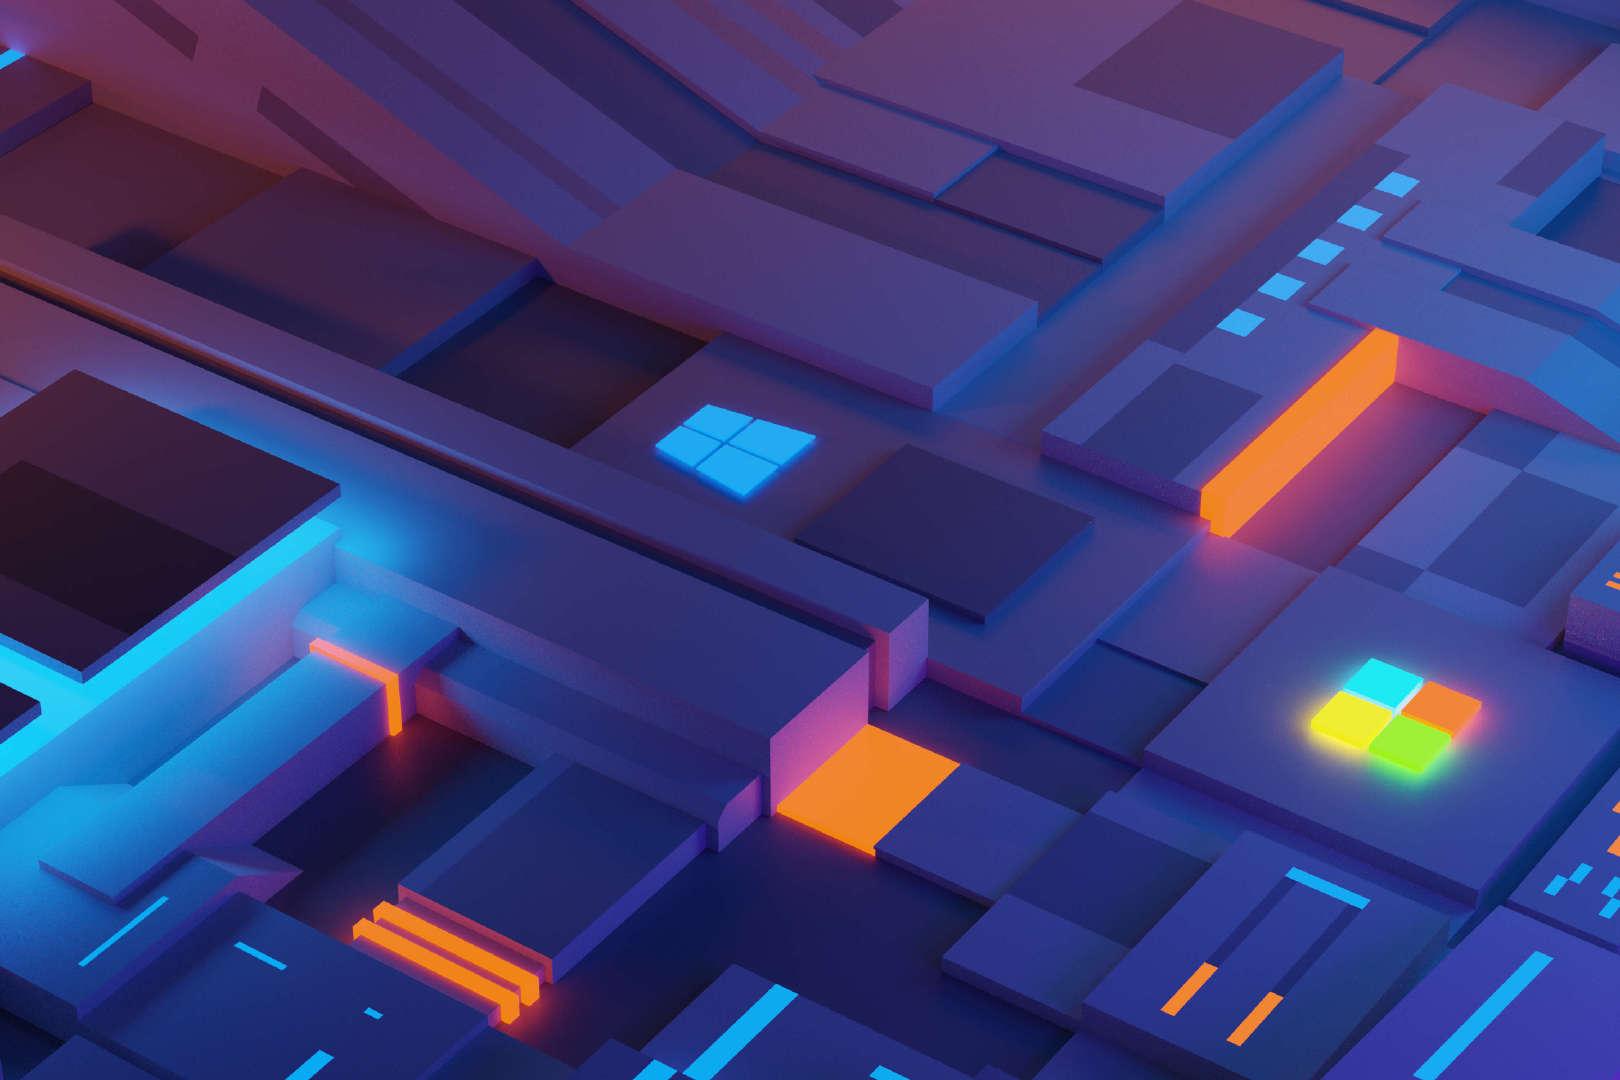 ◎ Microsoft